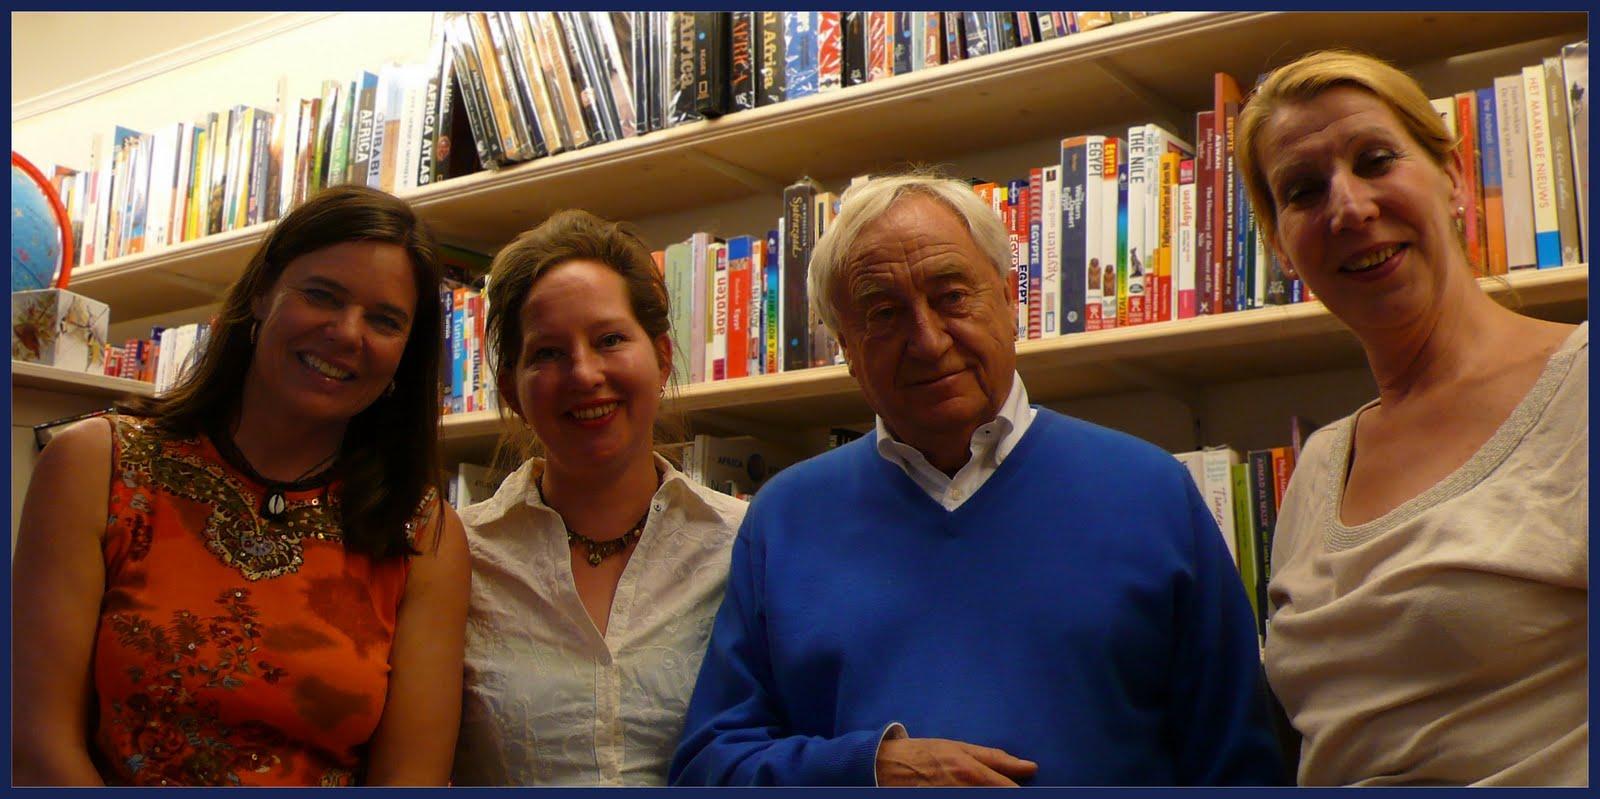 Bernice Notenboom, Nasja Berg reisboekhandel Stanley & Livingstone, Cees Nooteboom, Ank Szlapka Reisboekhandel Pied a Terre